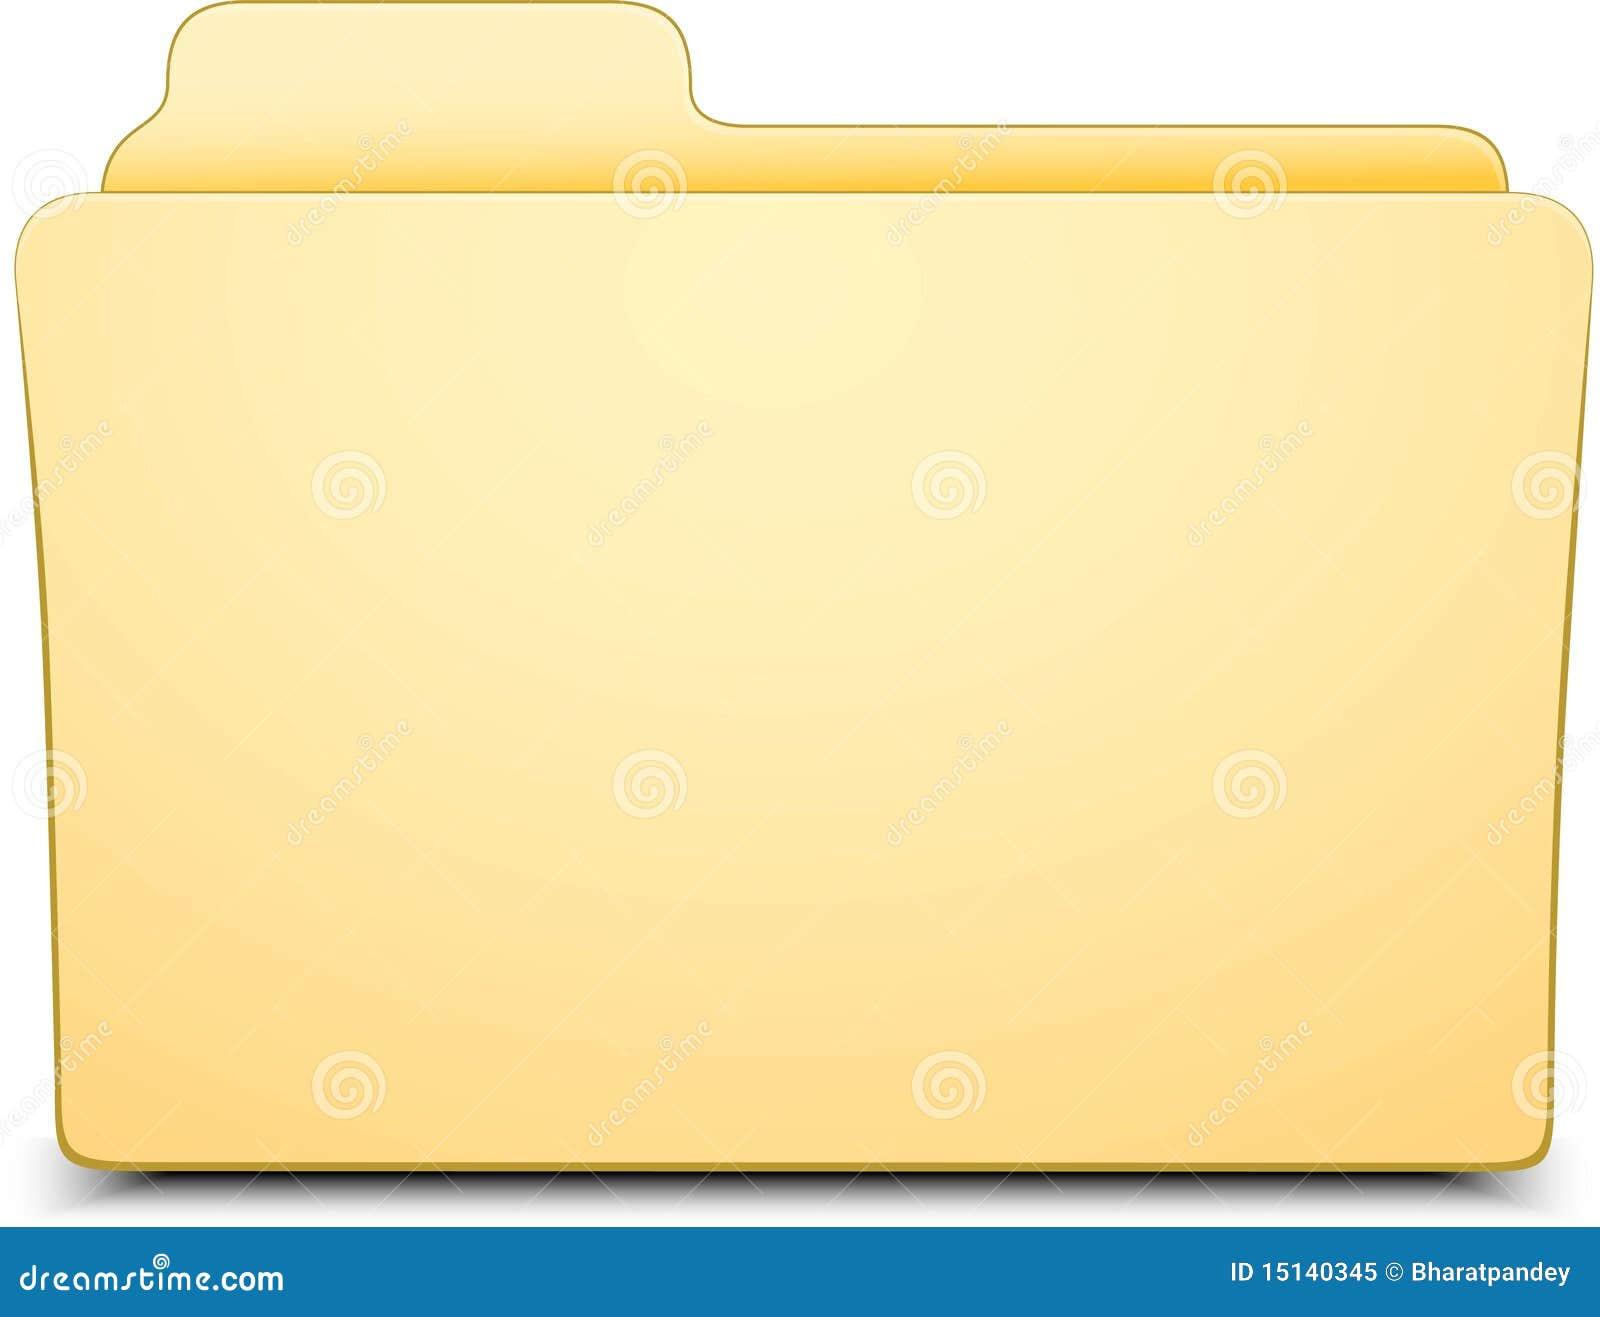 free clipart folder icon - photo #39